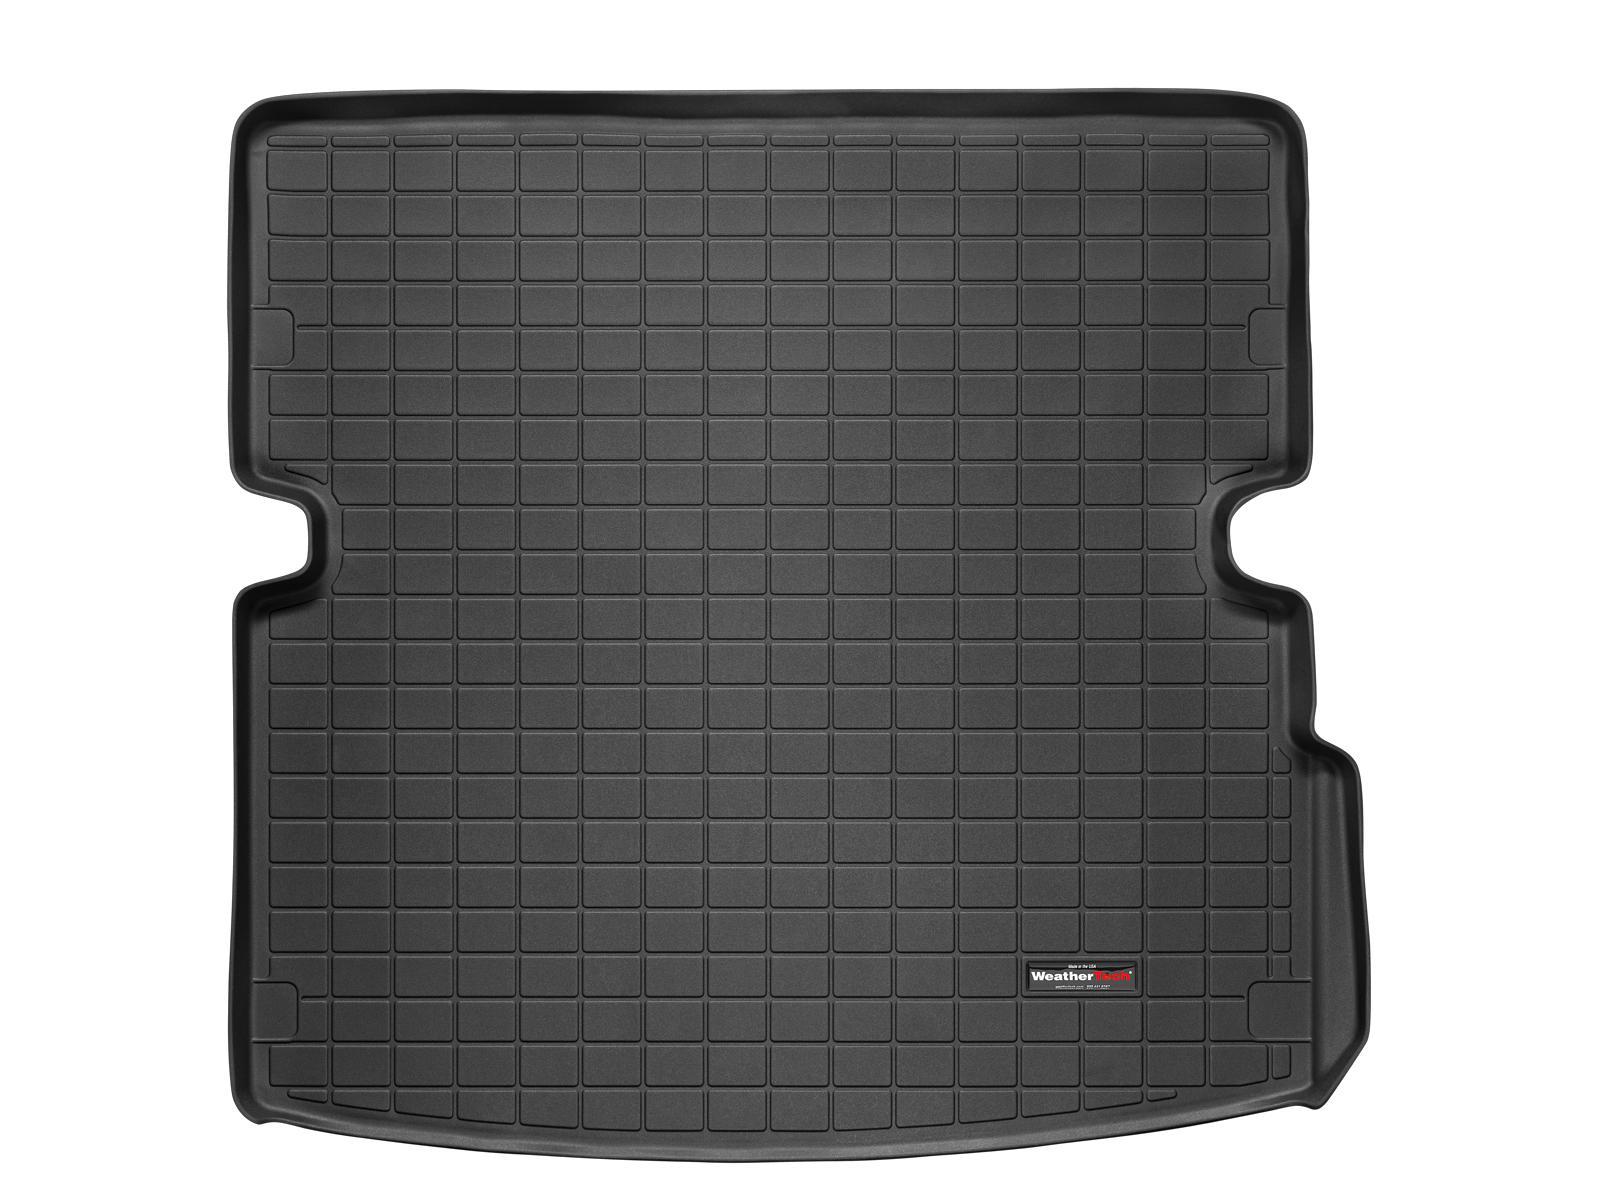 Audi Q7 2006>2013 Vasca proteggi baule tappeto bagagliaio nero *103